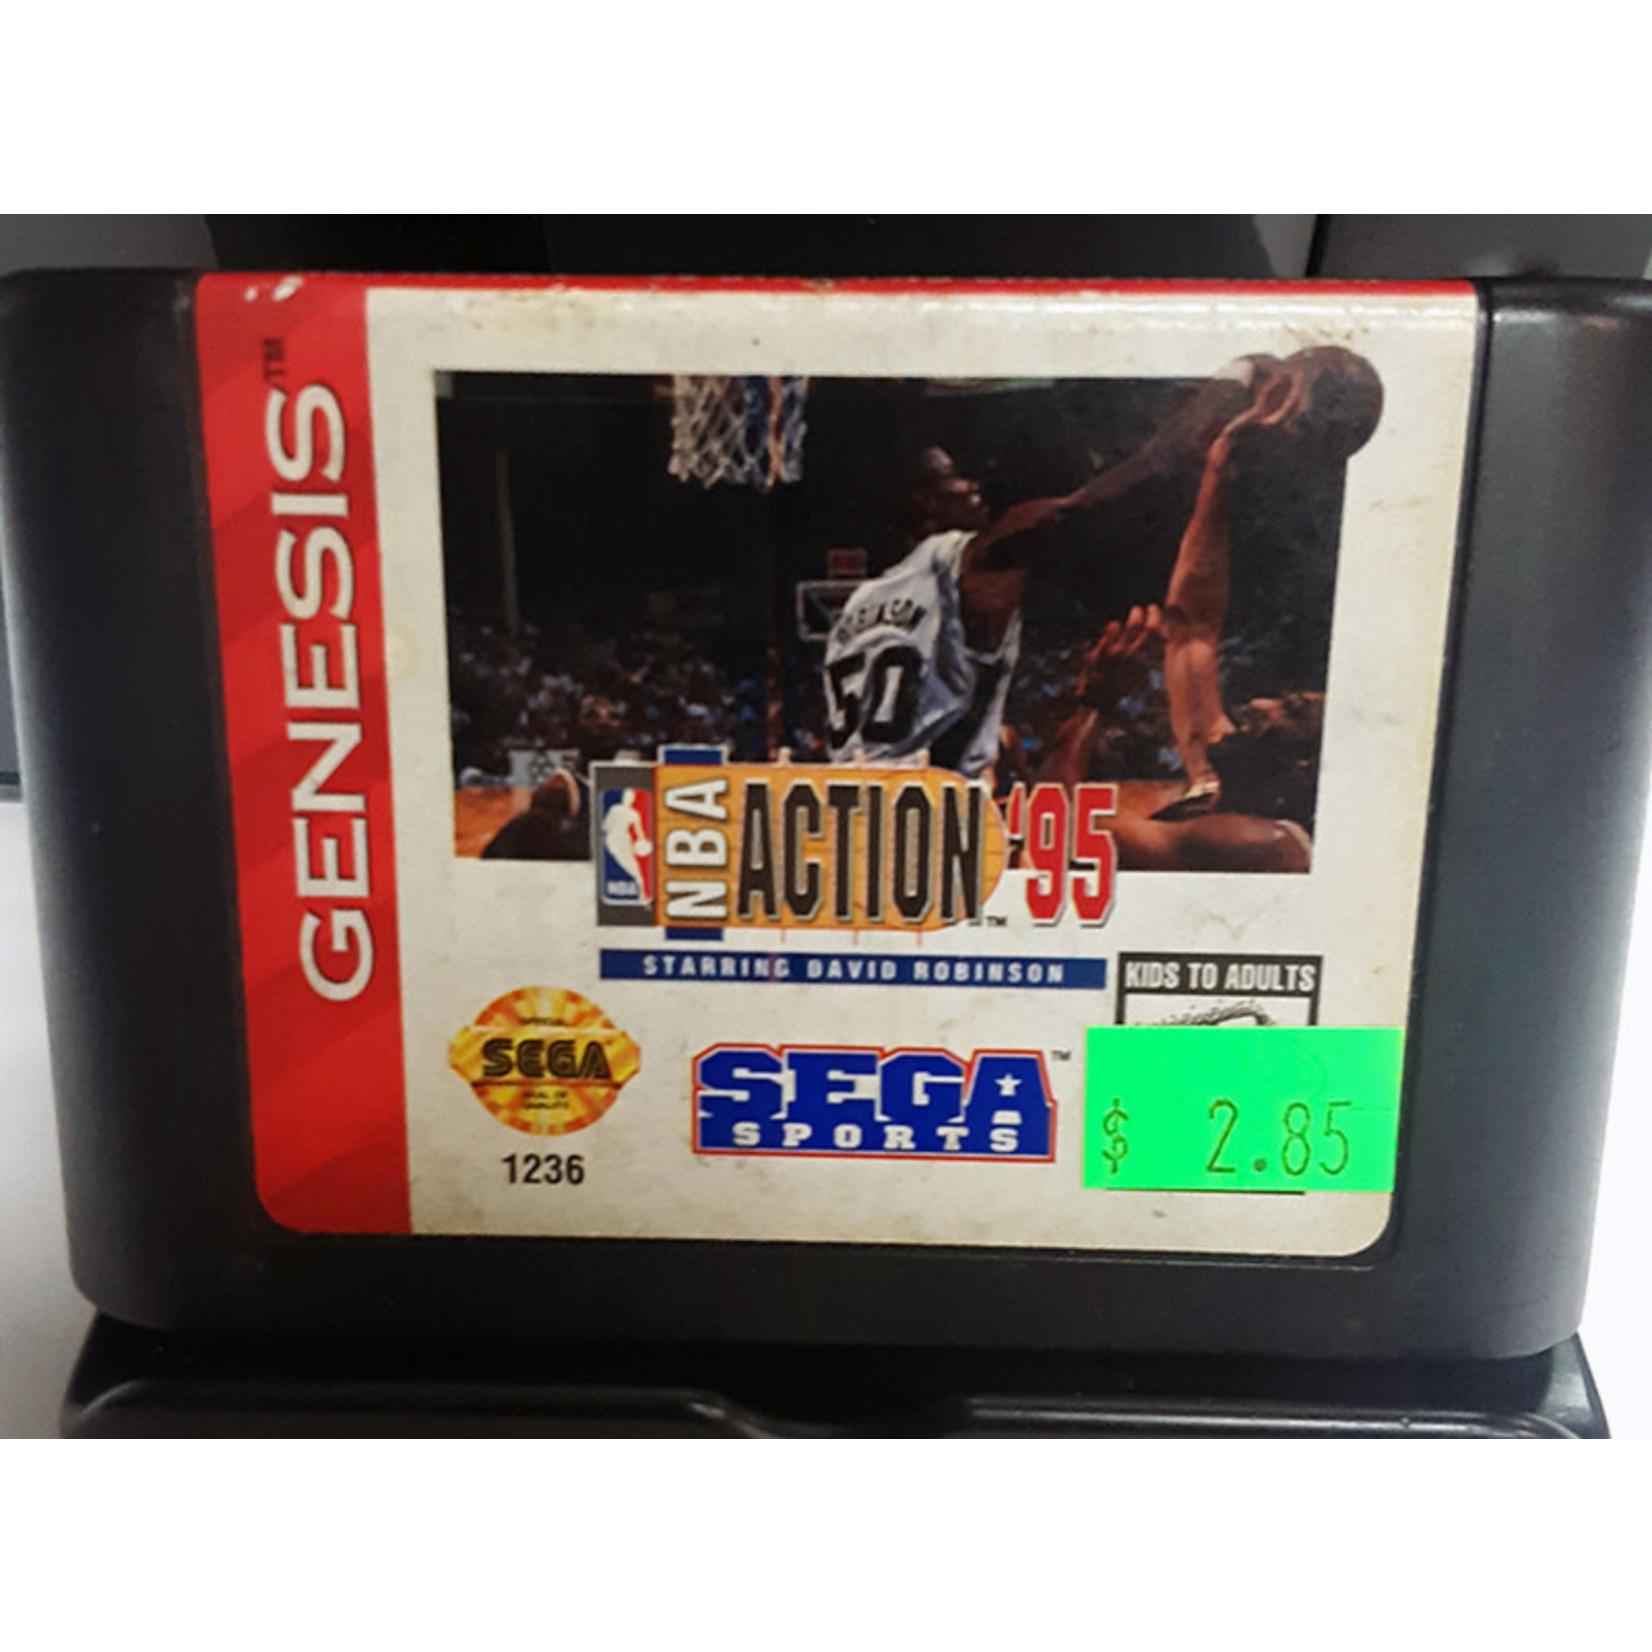 SGU-NBA Action '95 starring David Robinson (cartridge)